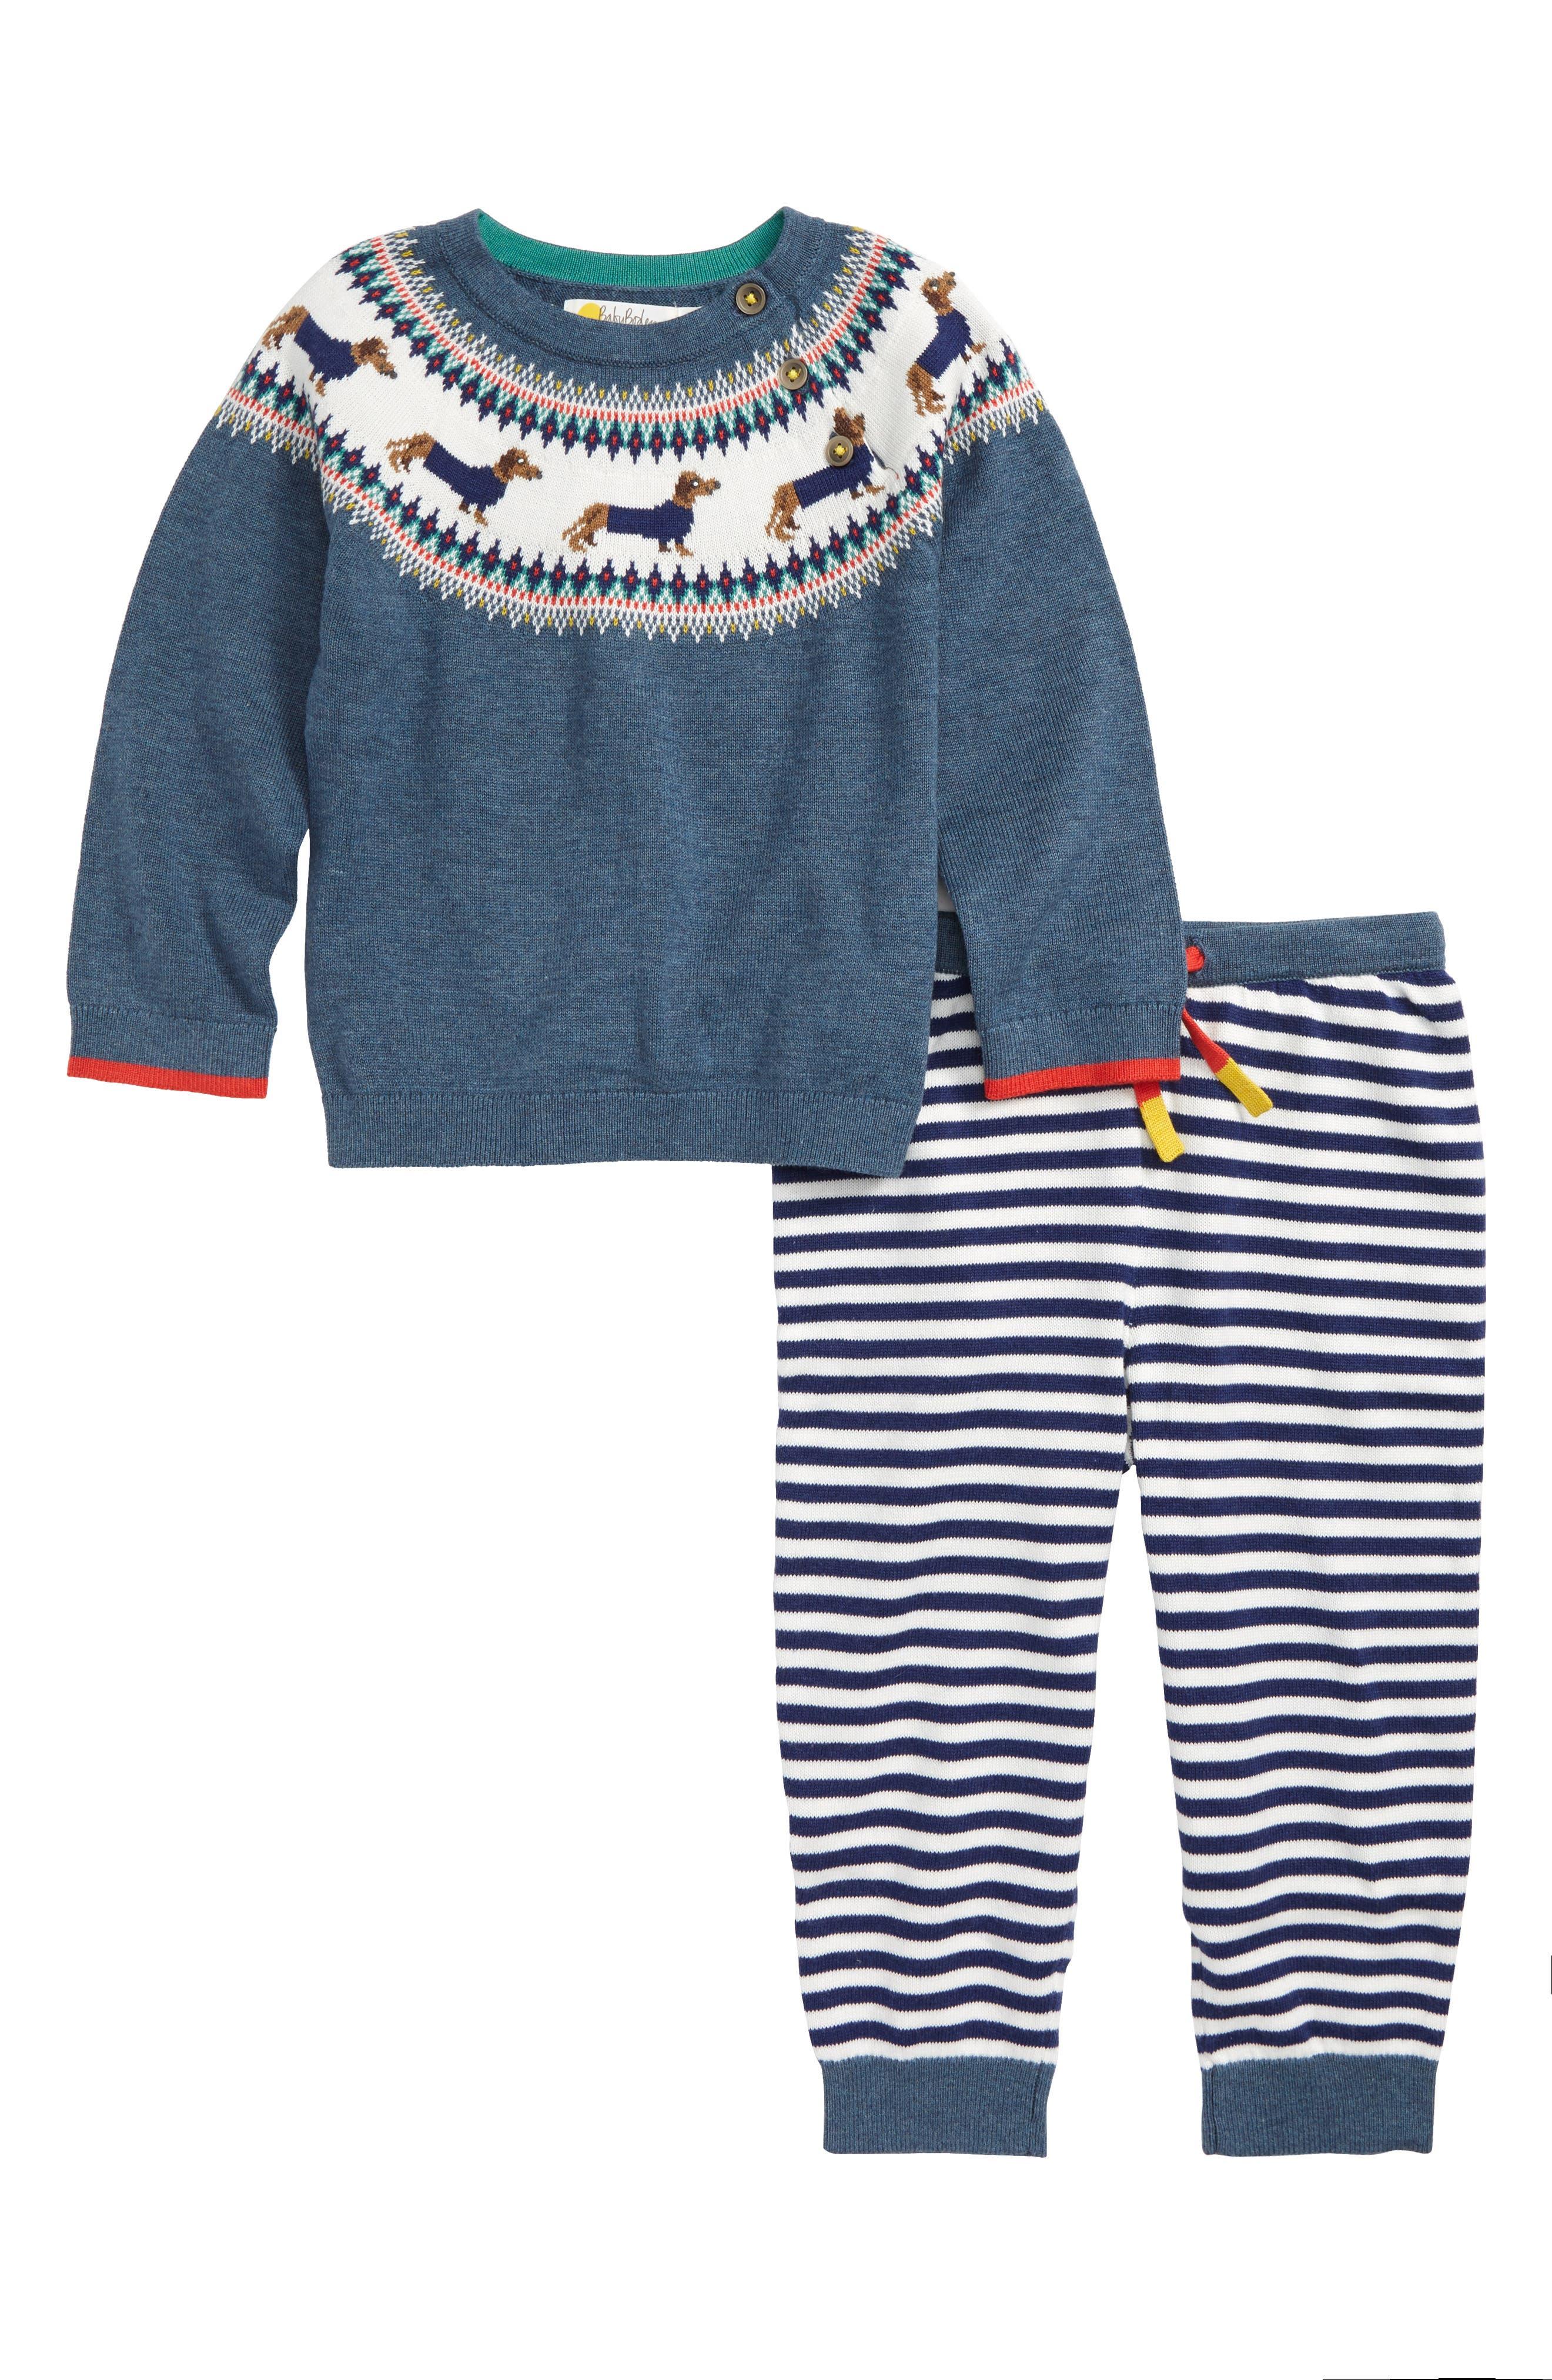 Intarsia Knit Sweater & Pants Set,                             Main thumbnail 1, color,                             424